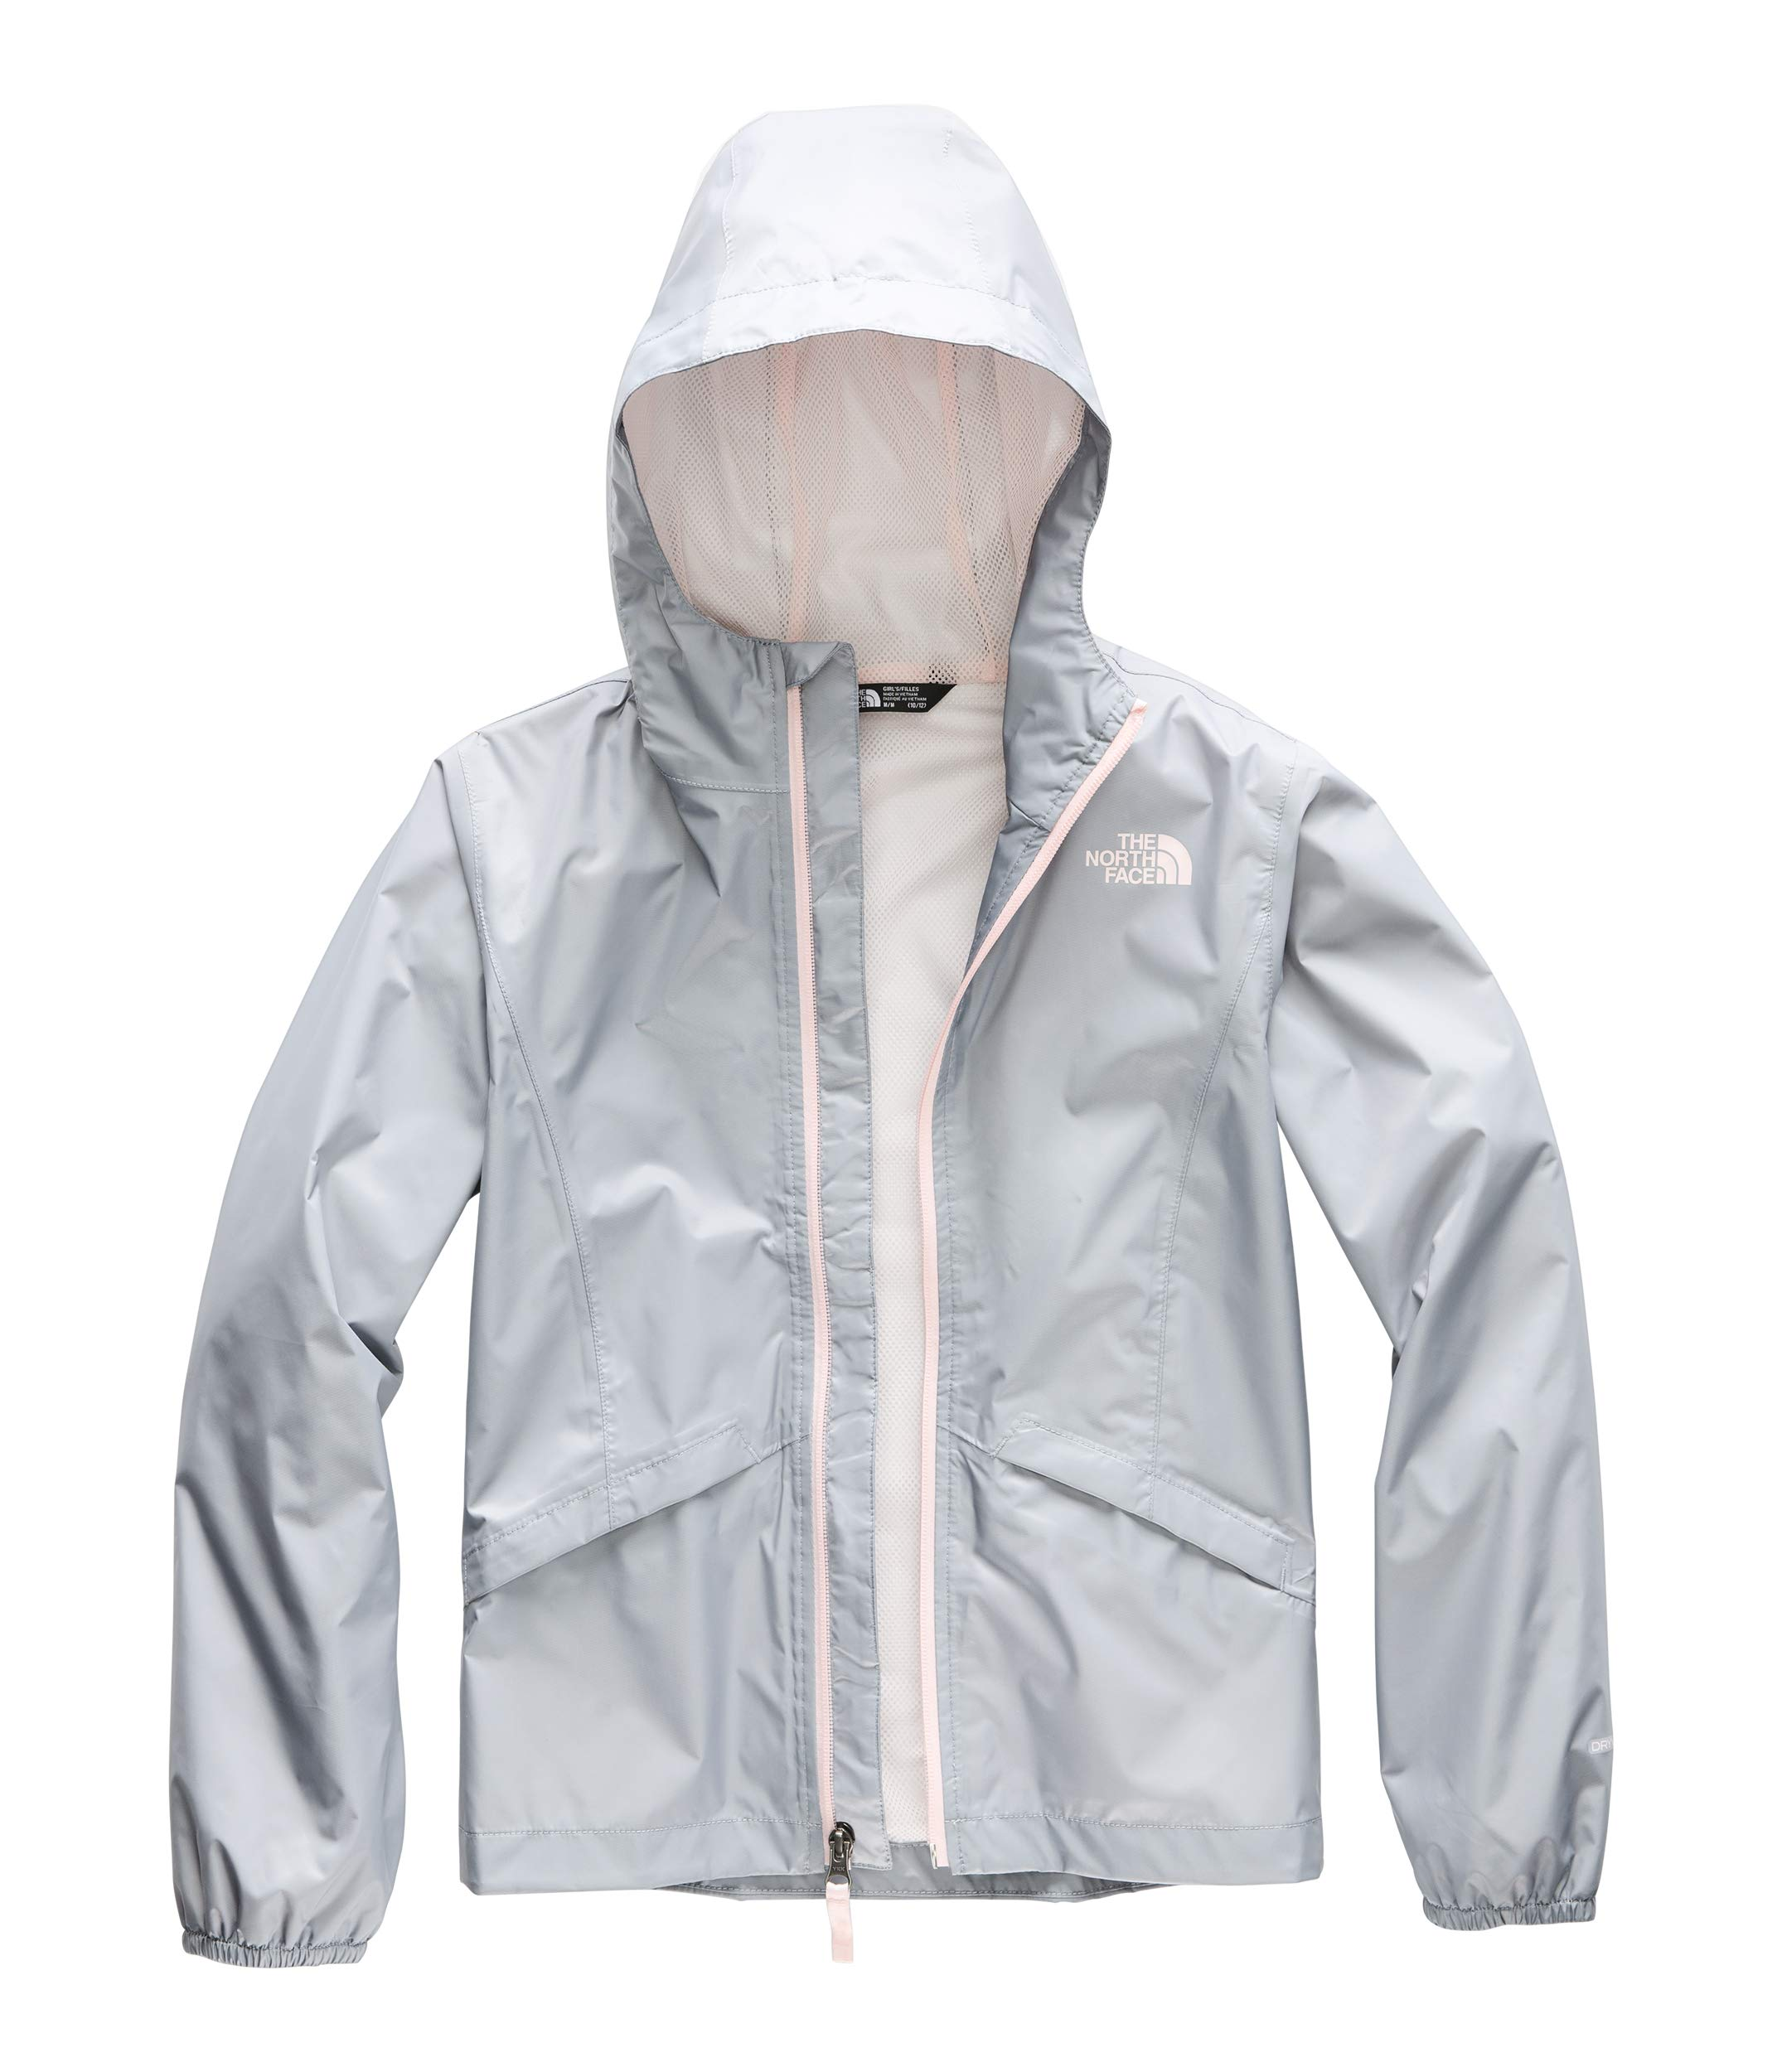 The North Face Kids Girl's Zipline Rain Jacket (Little Kids/Big Kids) Mid Grey Small